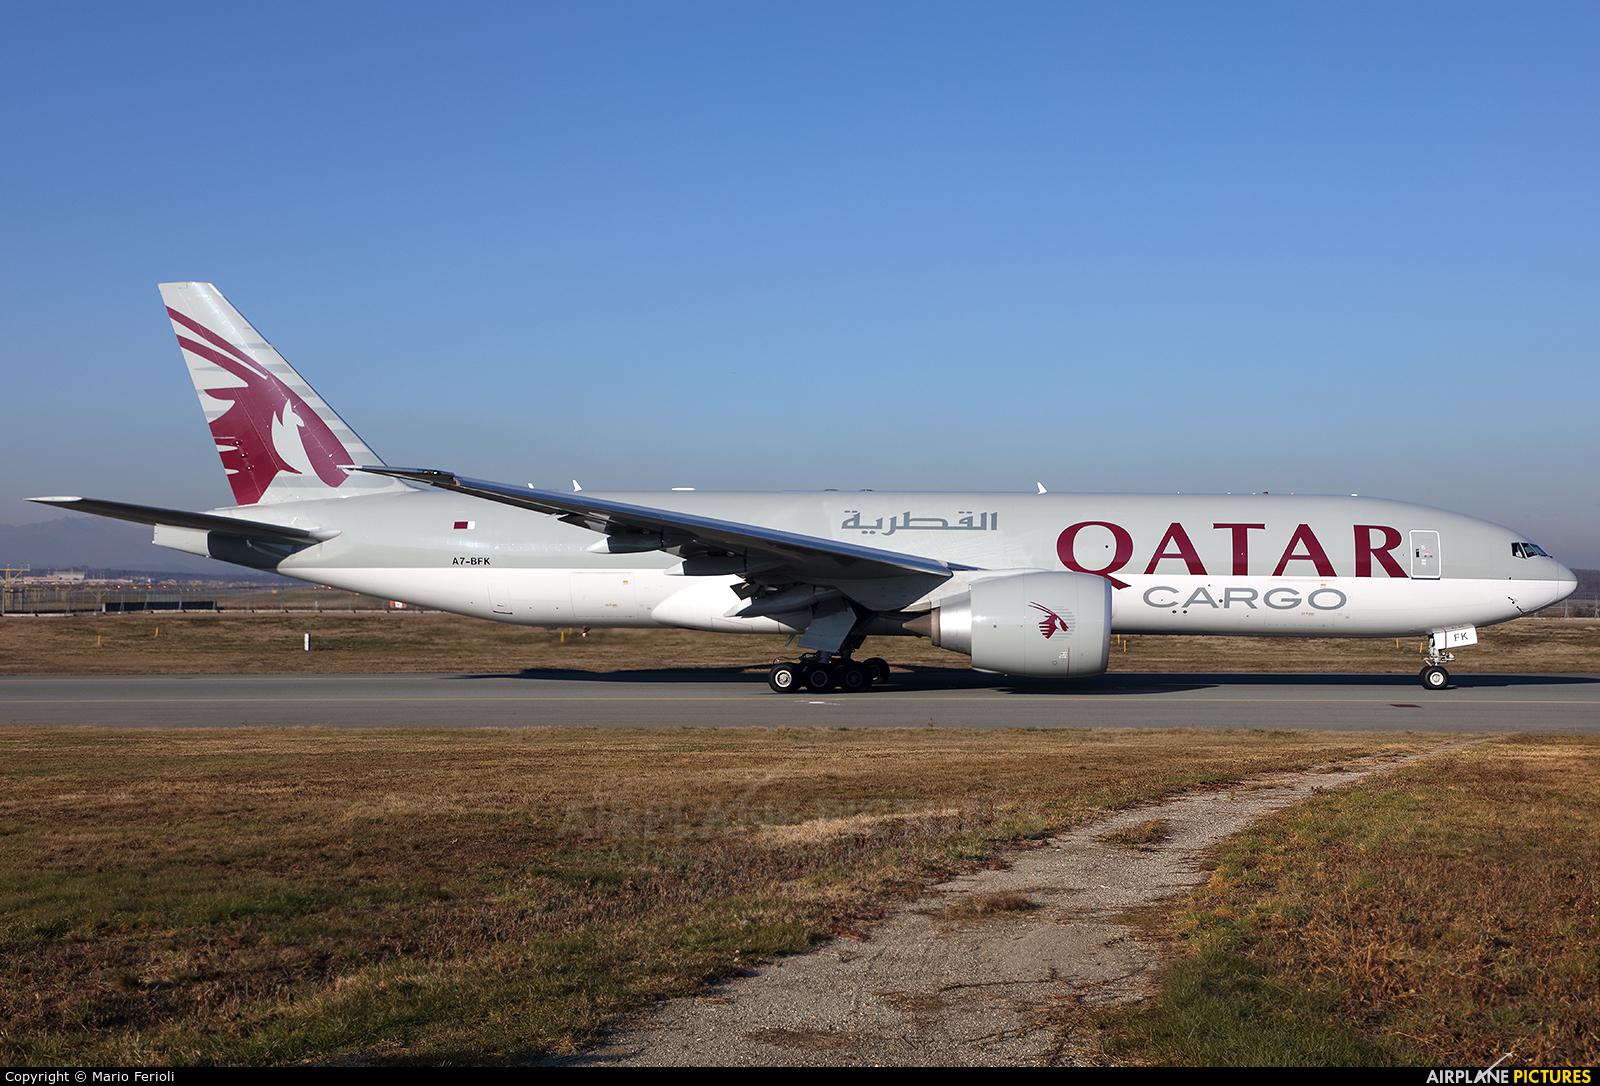 Qatar Airways Cargo A7-BFK aircraft at Milan - Malpensa